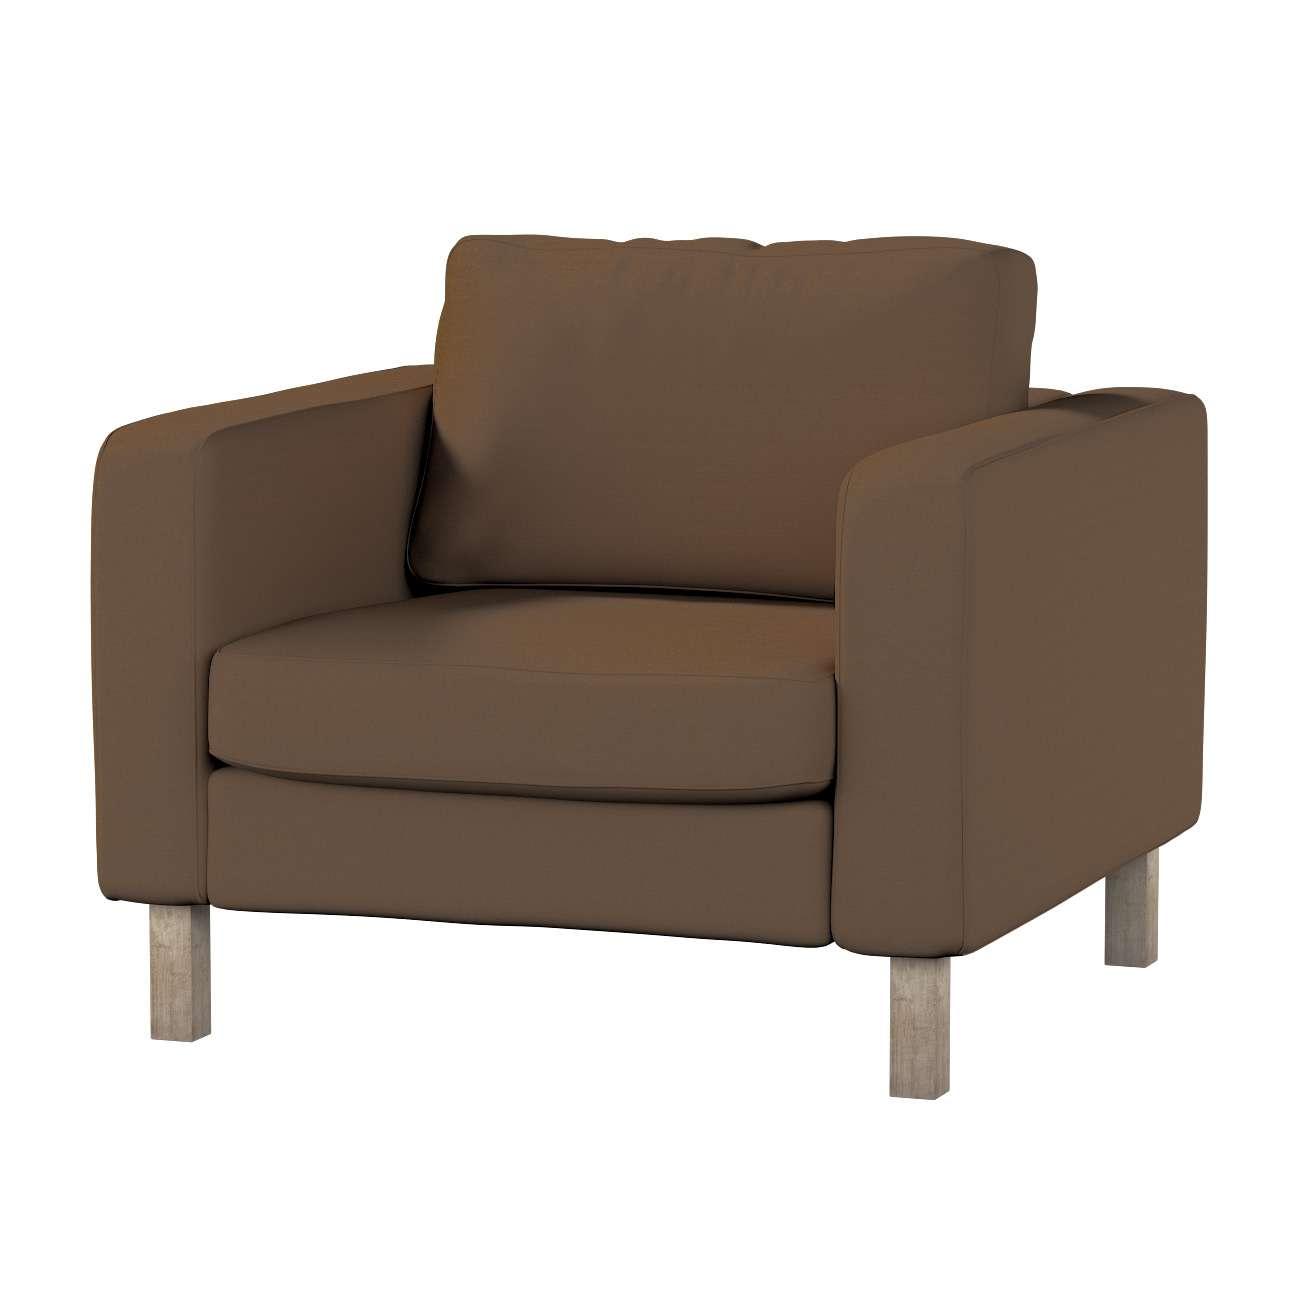 Karlstad Sesselbezug Sesselhusse, Karlstad Sessel von der Kollektion Cotton Panama, Stoff: 702-02